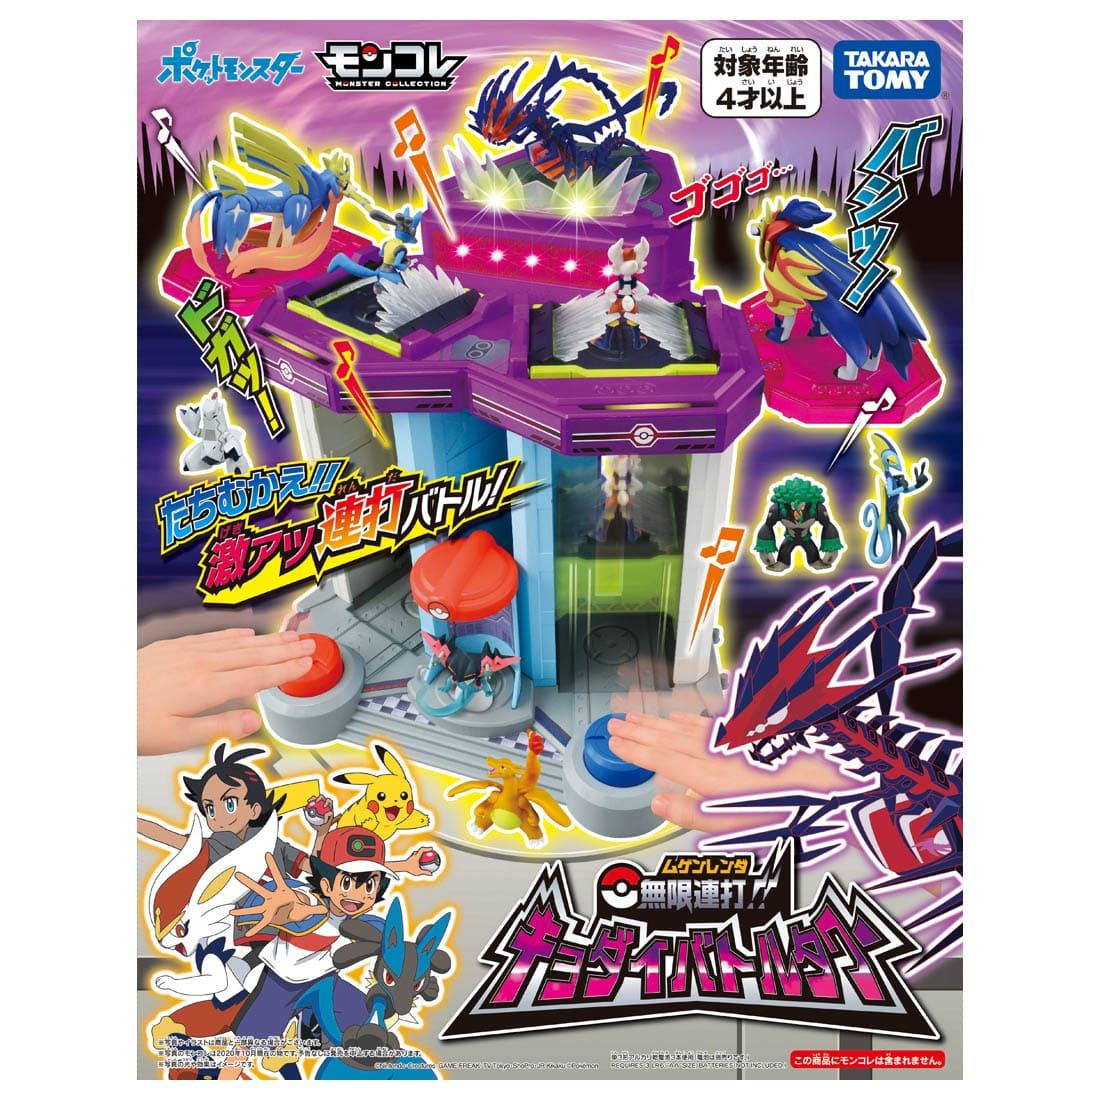 TOMY 精靈寶可夢 神奇寶貝 無限連擊戰鬥塔!